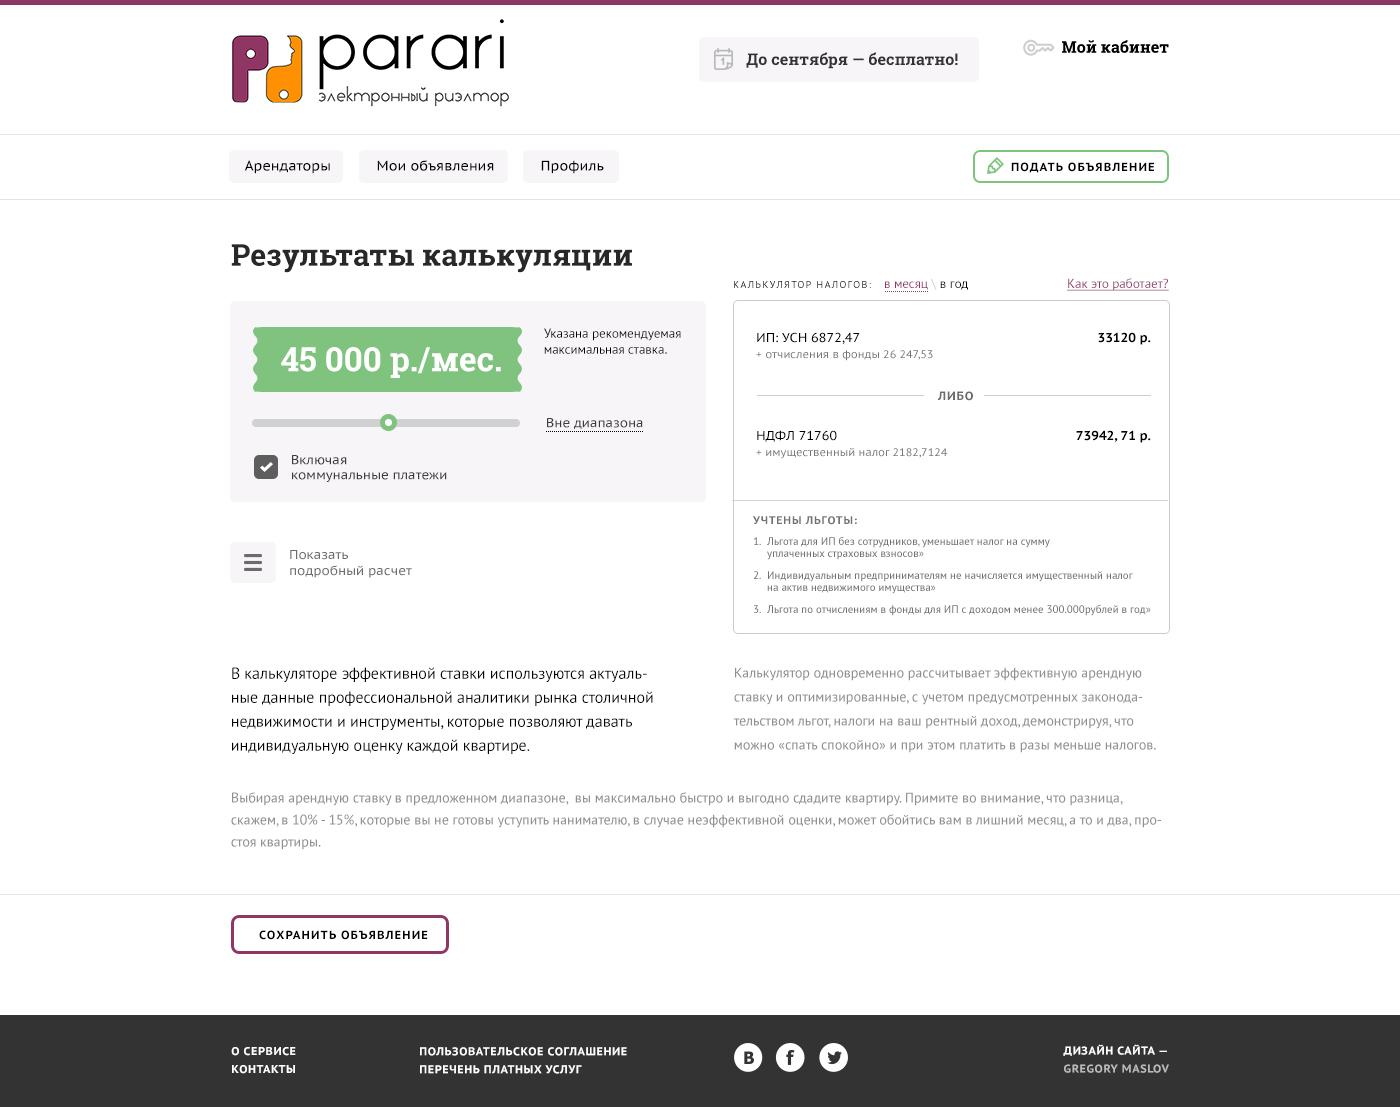 PARARI-31.01.14-CALC-RESULTS